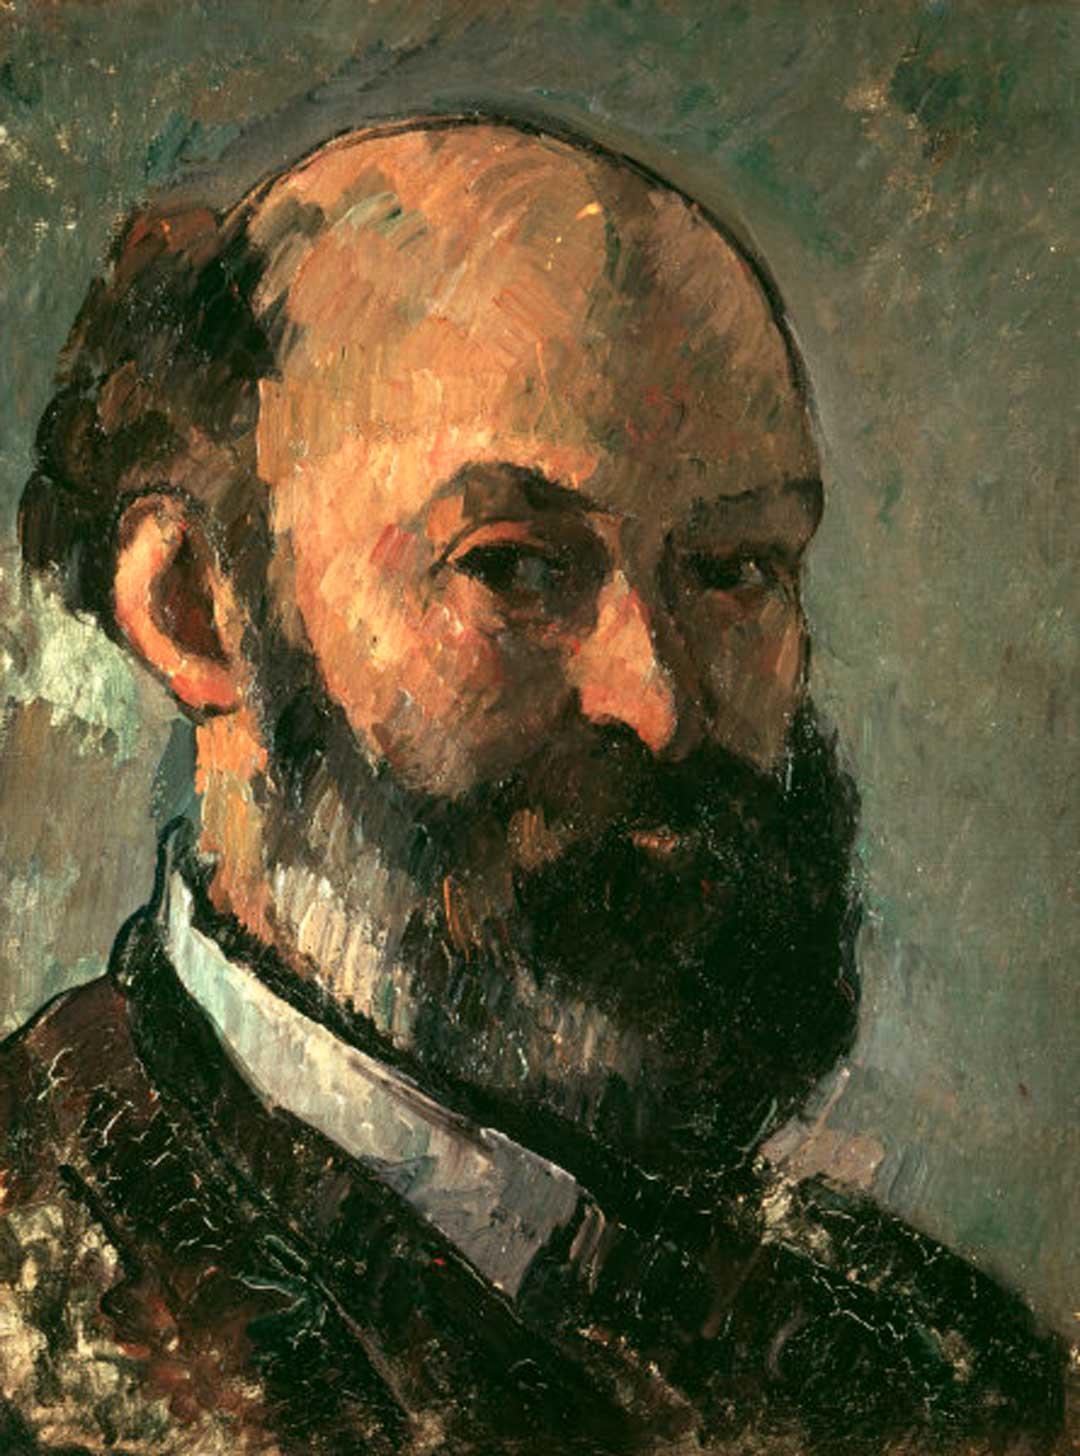 Paul Cézanne: Selbstbildnis, um 1880, Stiftung Oskar Reinhart Winterthur; aus: Steven Platzman, Cézanne – the self-portraits (London: Thames & Hudson, 2001), S. 16